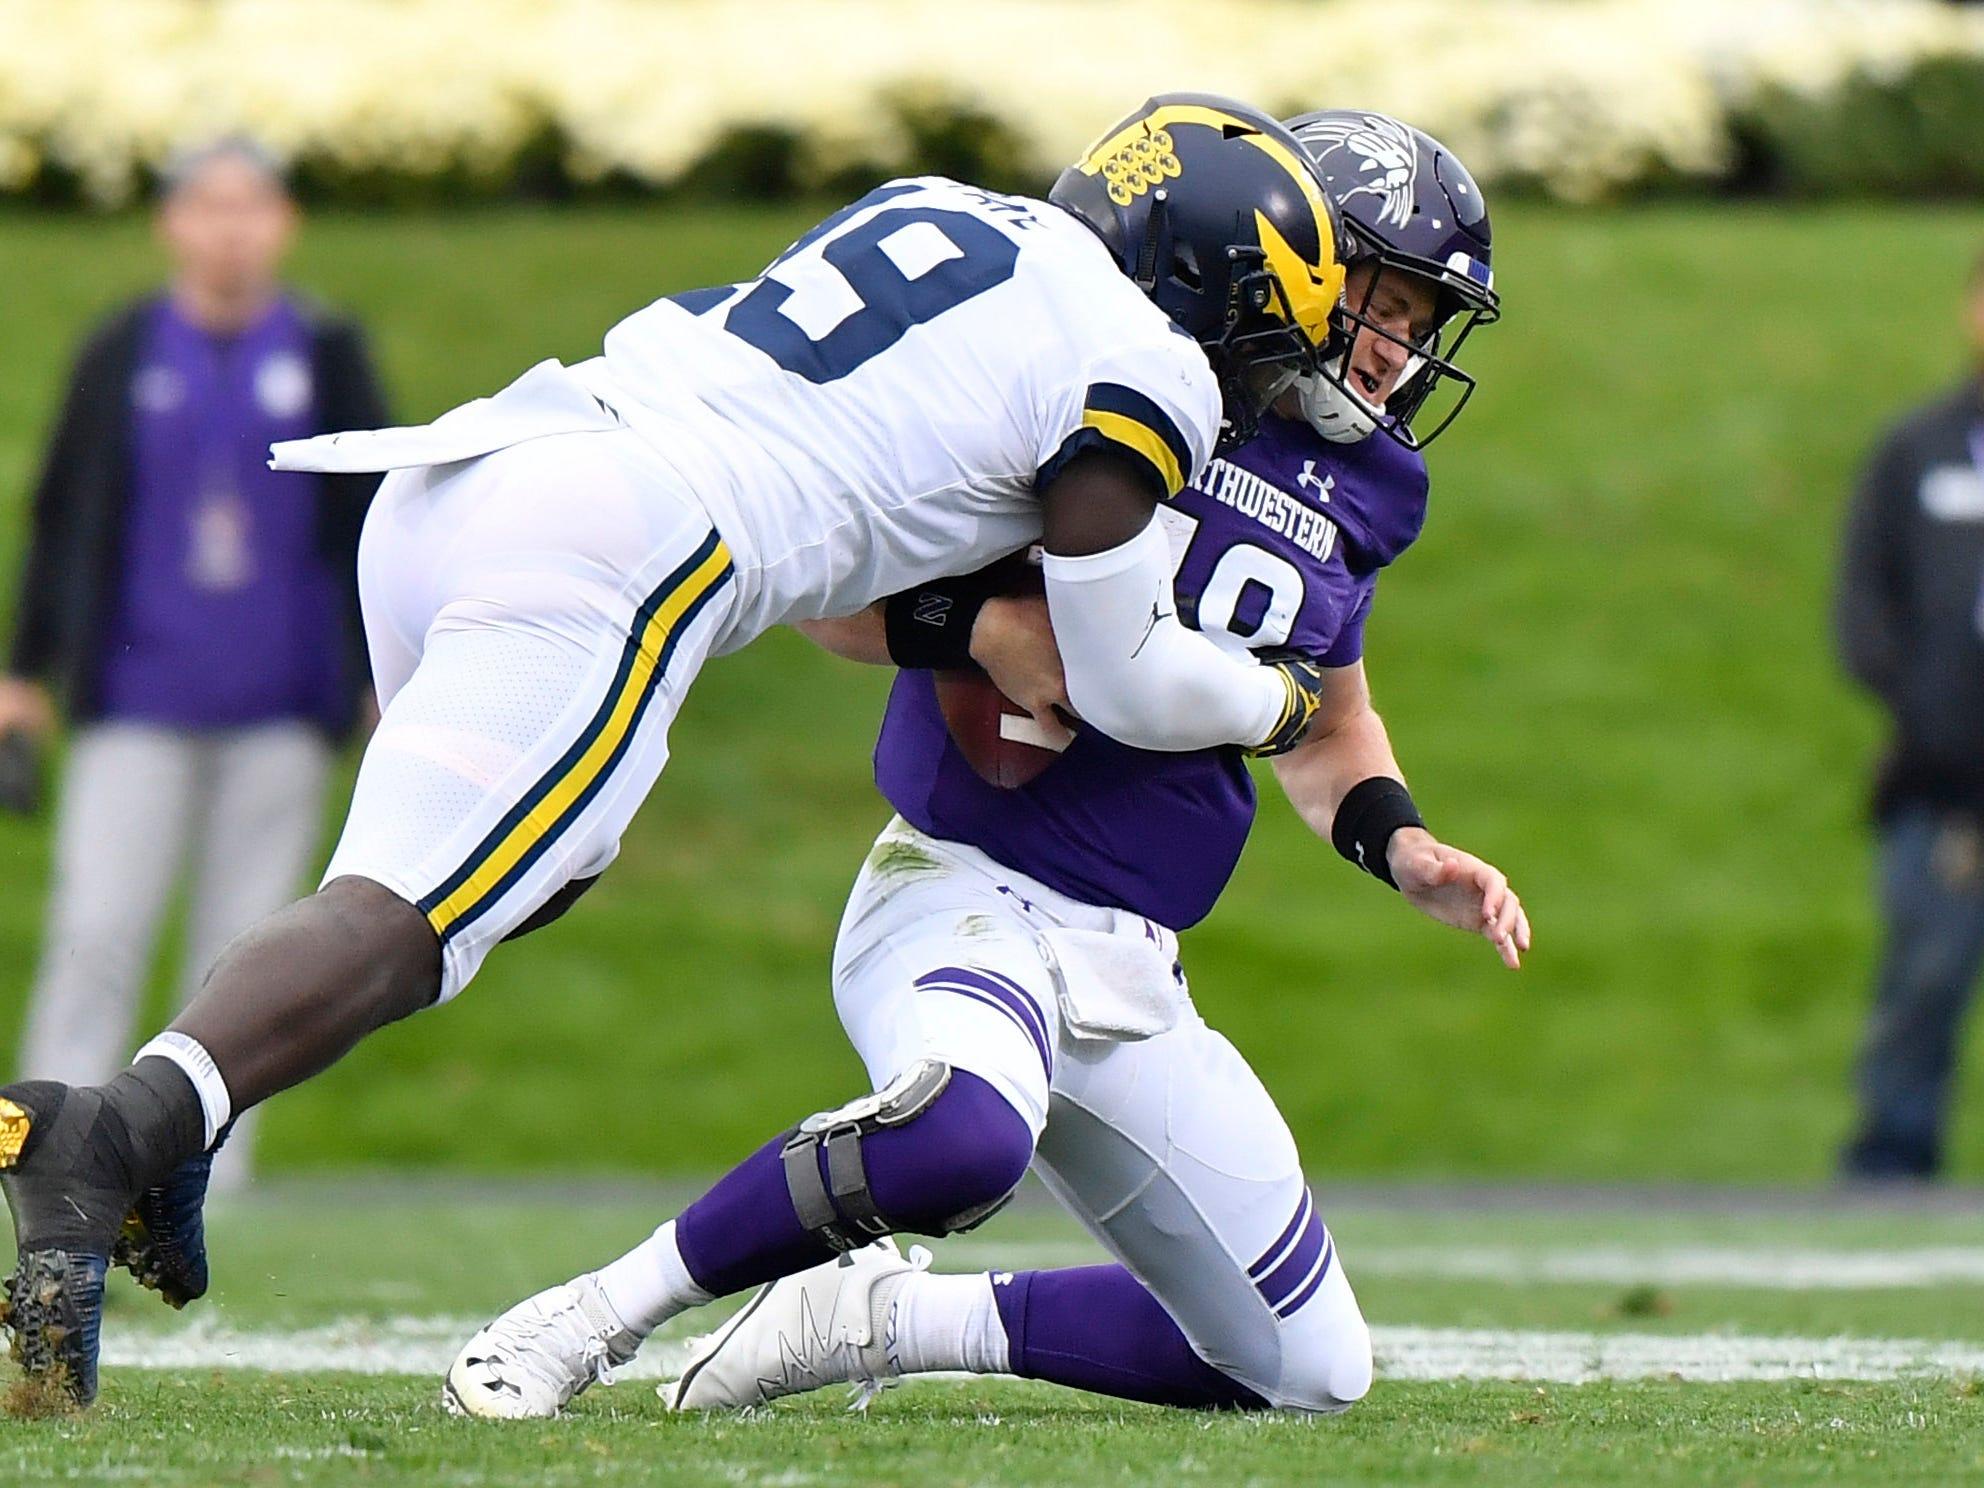 Michigan's Kwity Paye sacks Northwestern quarterback Clayton Thorson in the first half at Ryan Field on Sept. 29, 2018 in Evanston, Ill.